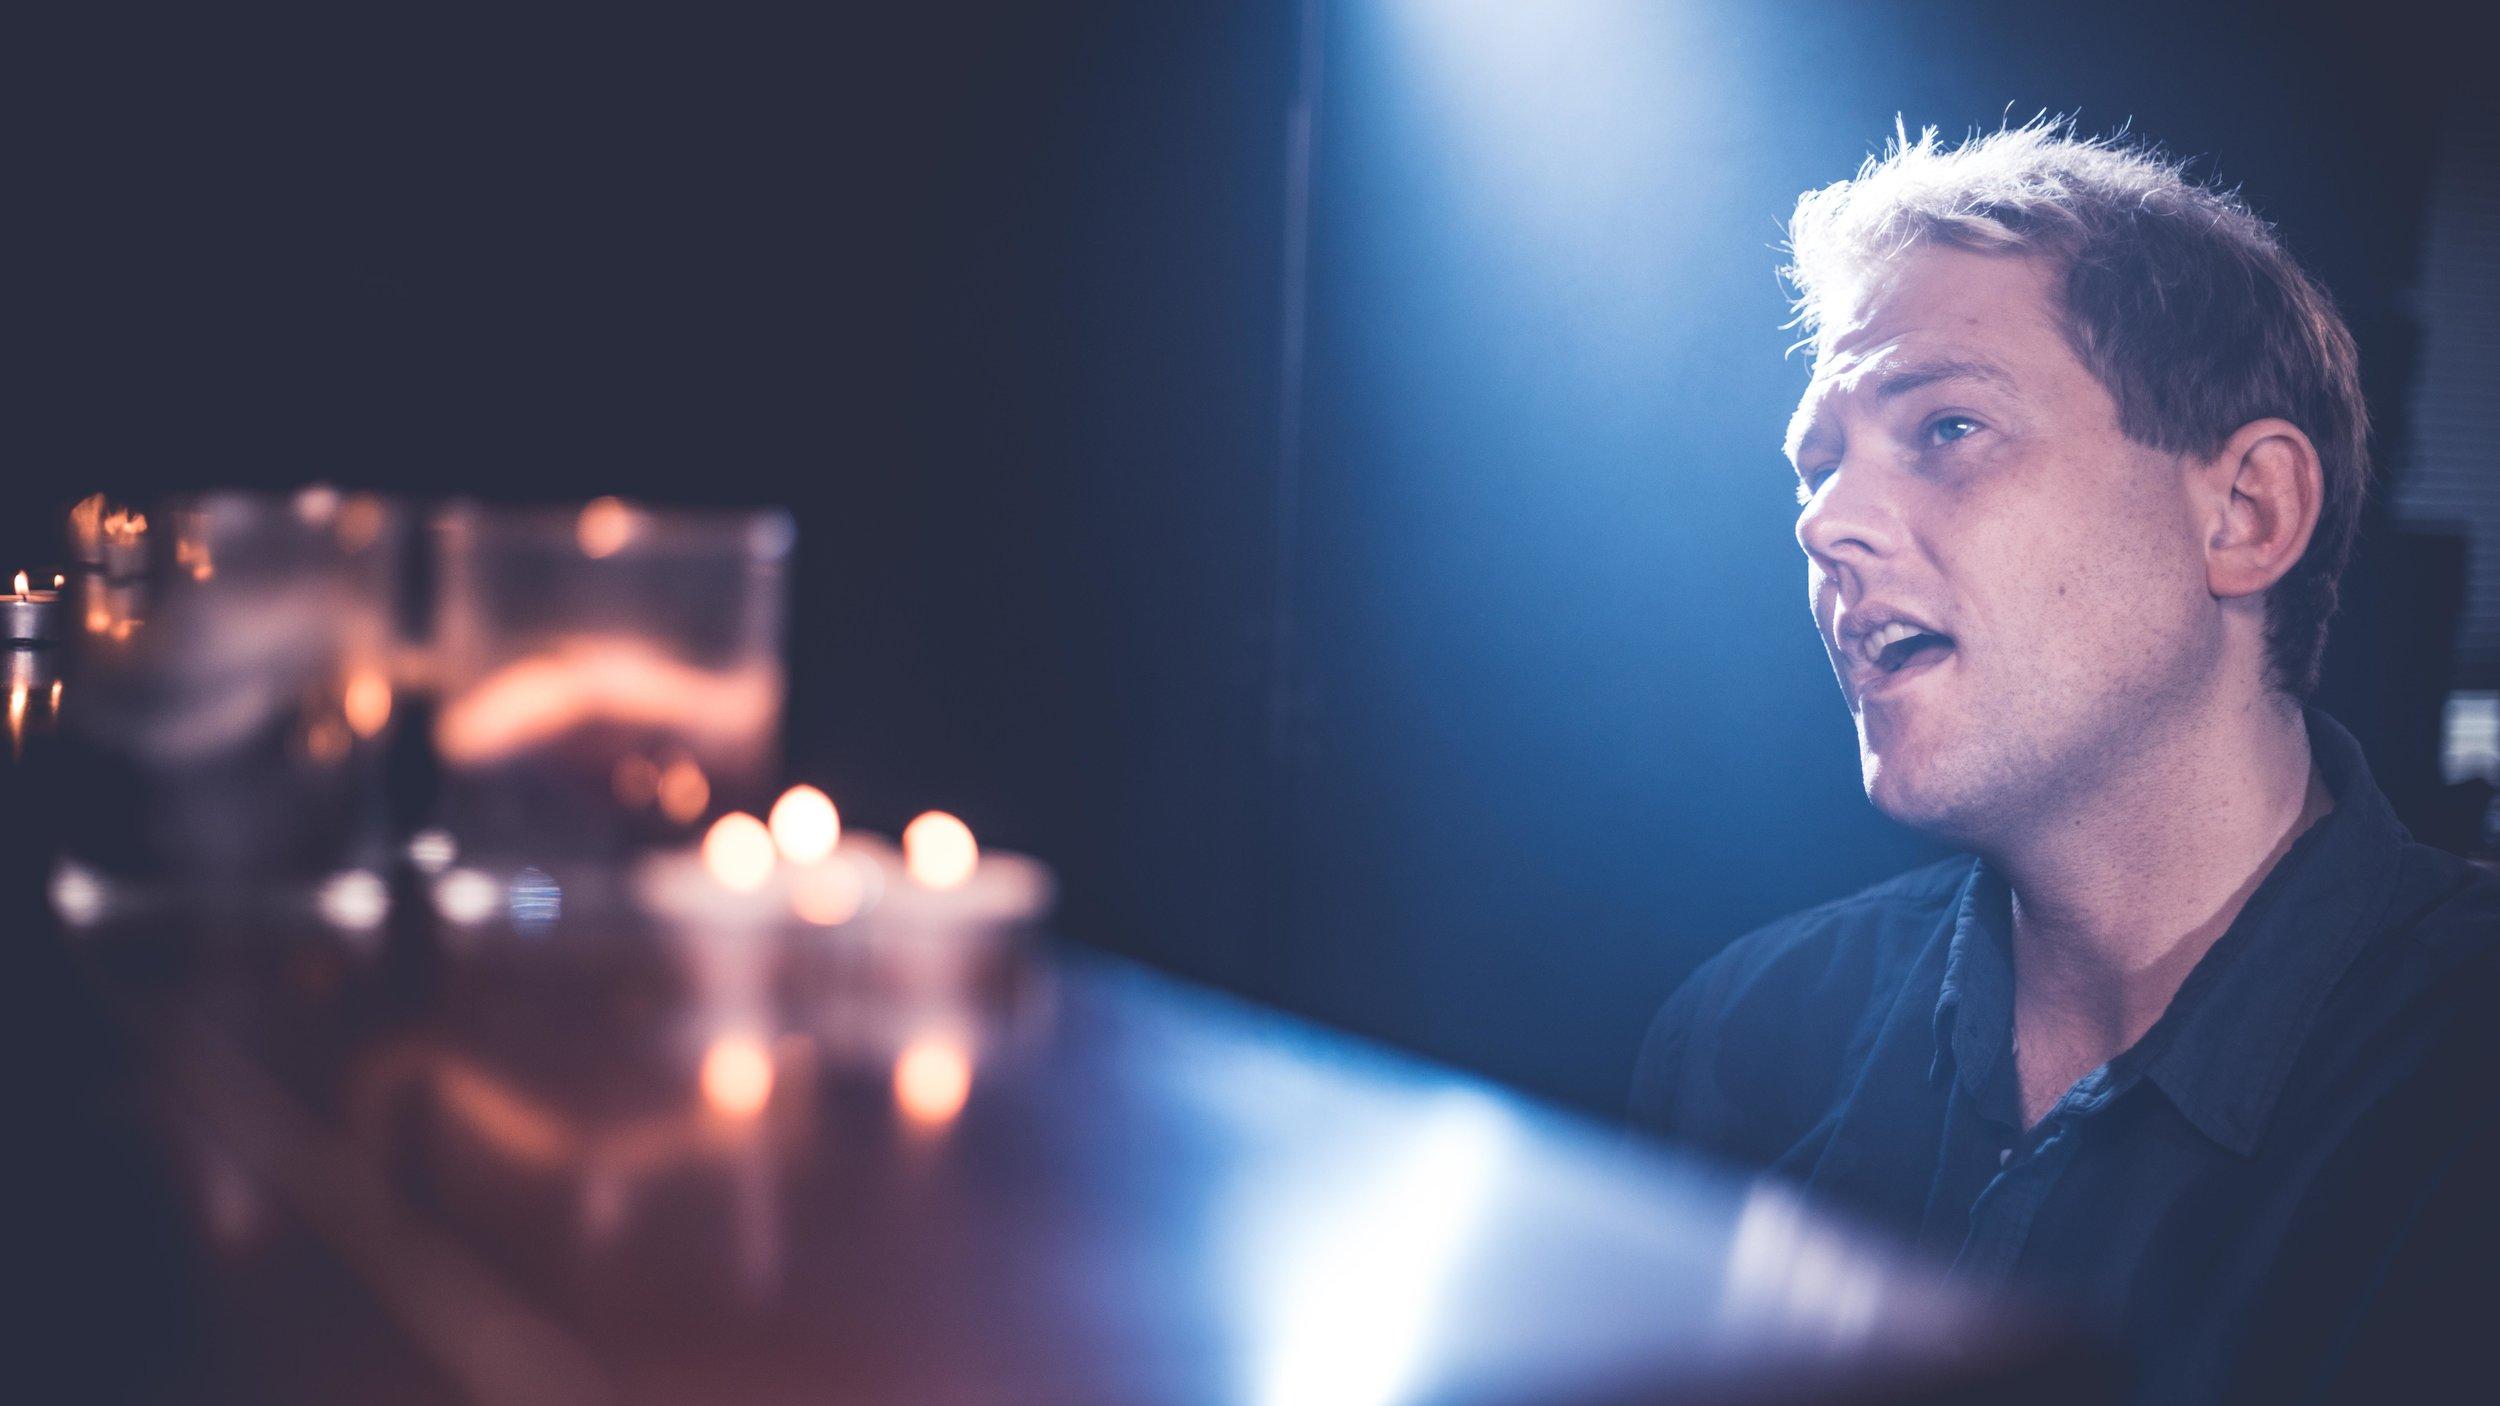 Anders Hornshøj - videoshoot